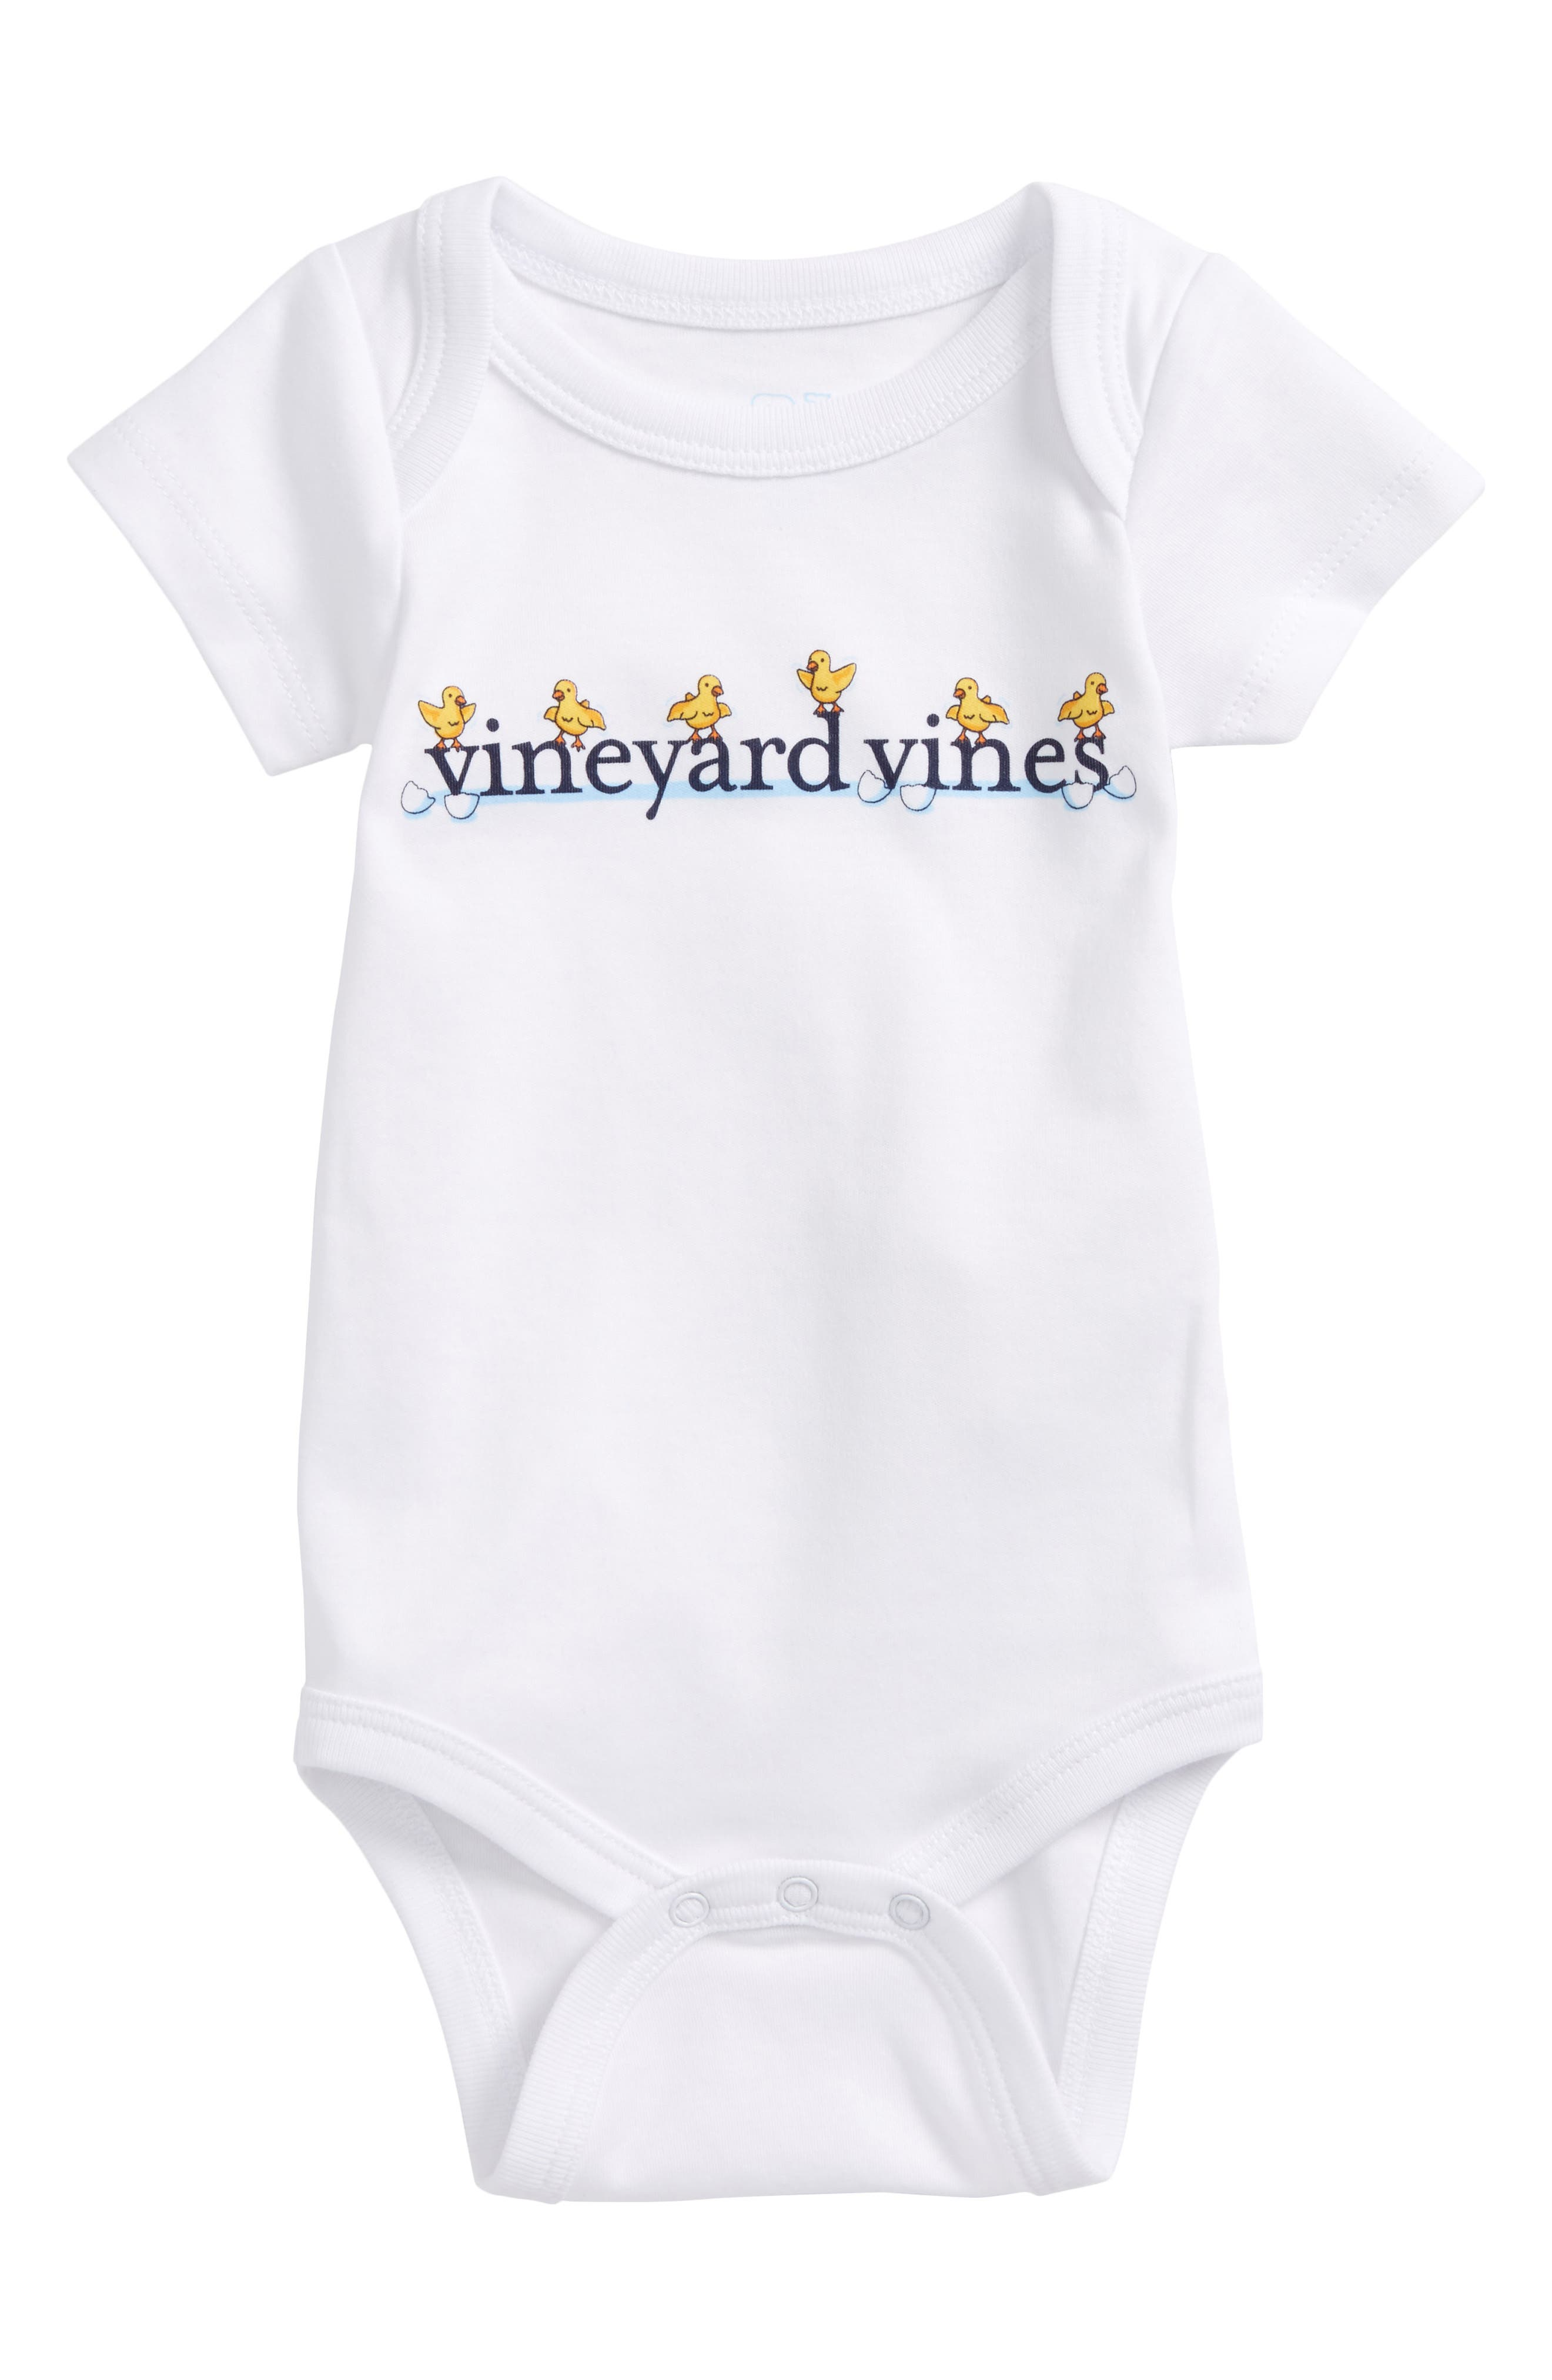 Main Image - vineyard vines Easter Chick Pima Cotton Bodysuit (Baby)